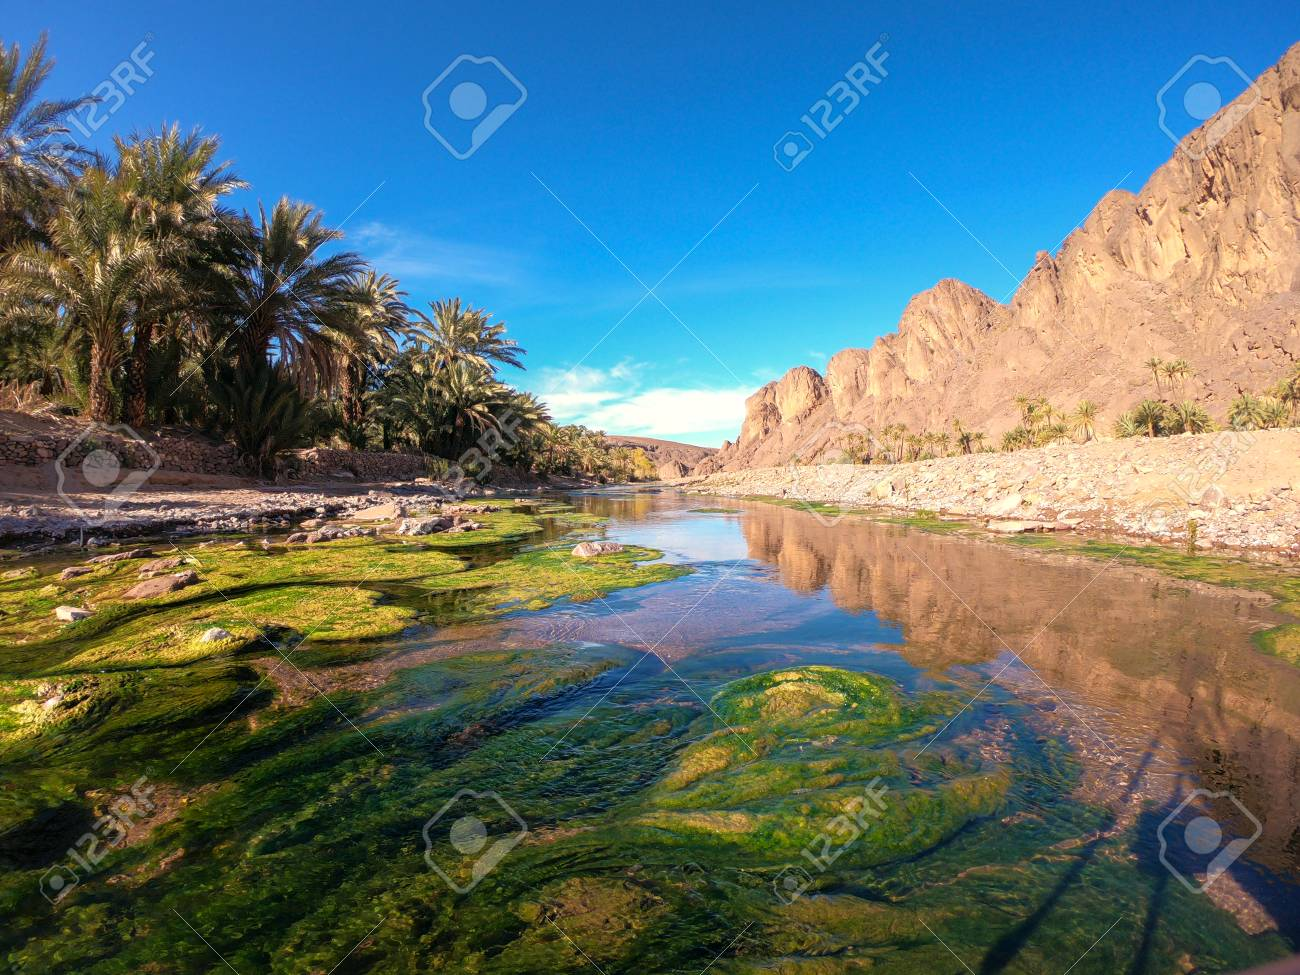 Beautiful Desert oasis landscape in Oasis De Fint near Ourzazate in Morocco, North Africa - 119221460